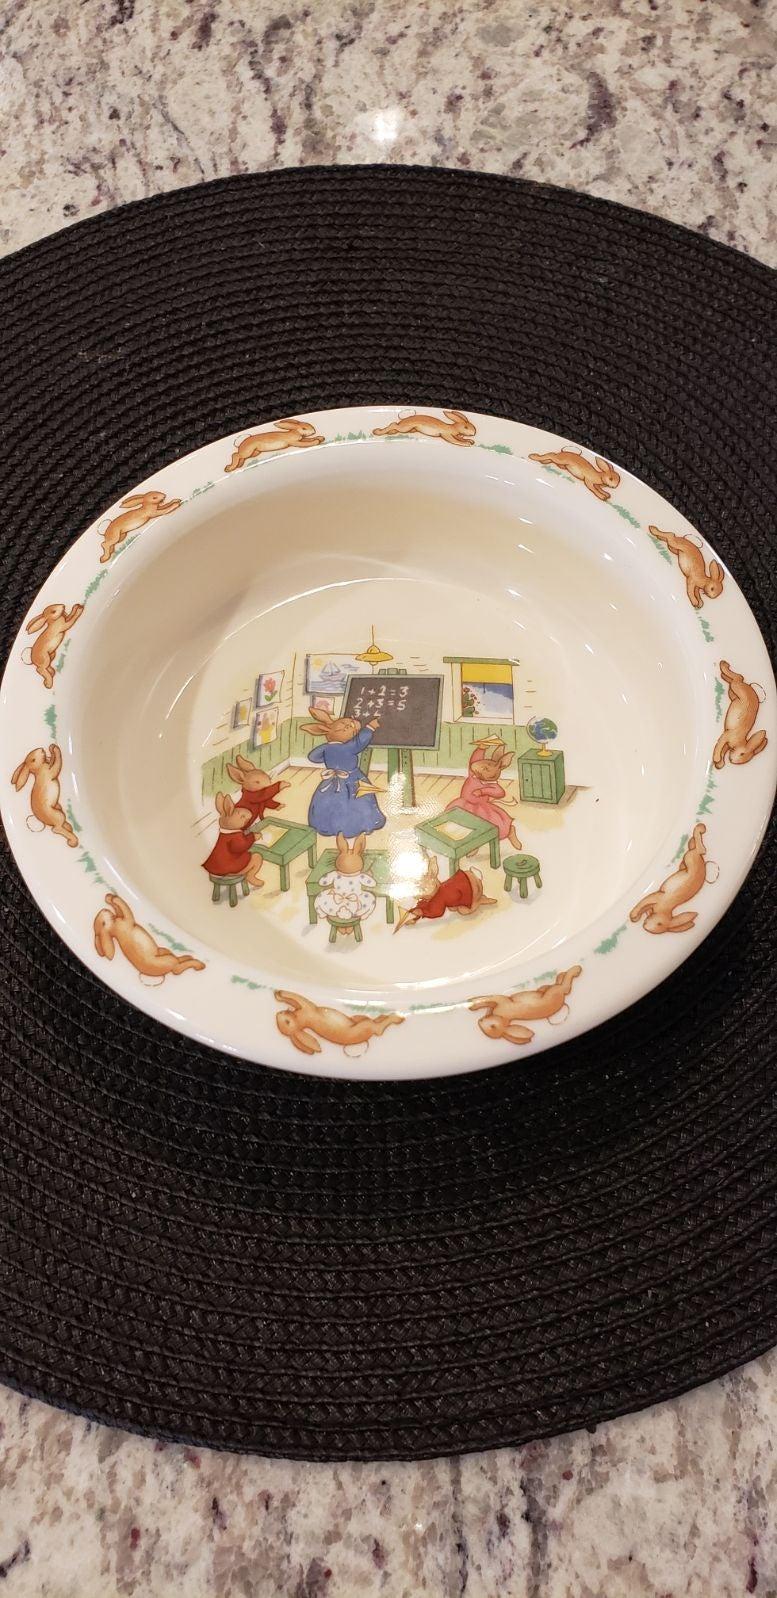 Royal Doulton 1936 Bunnykins cereal bowl